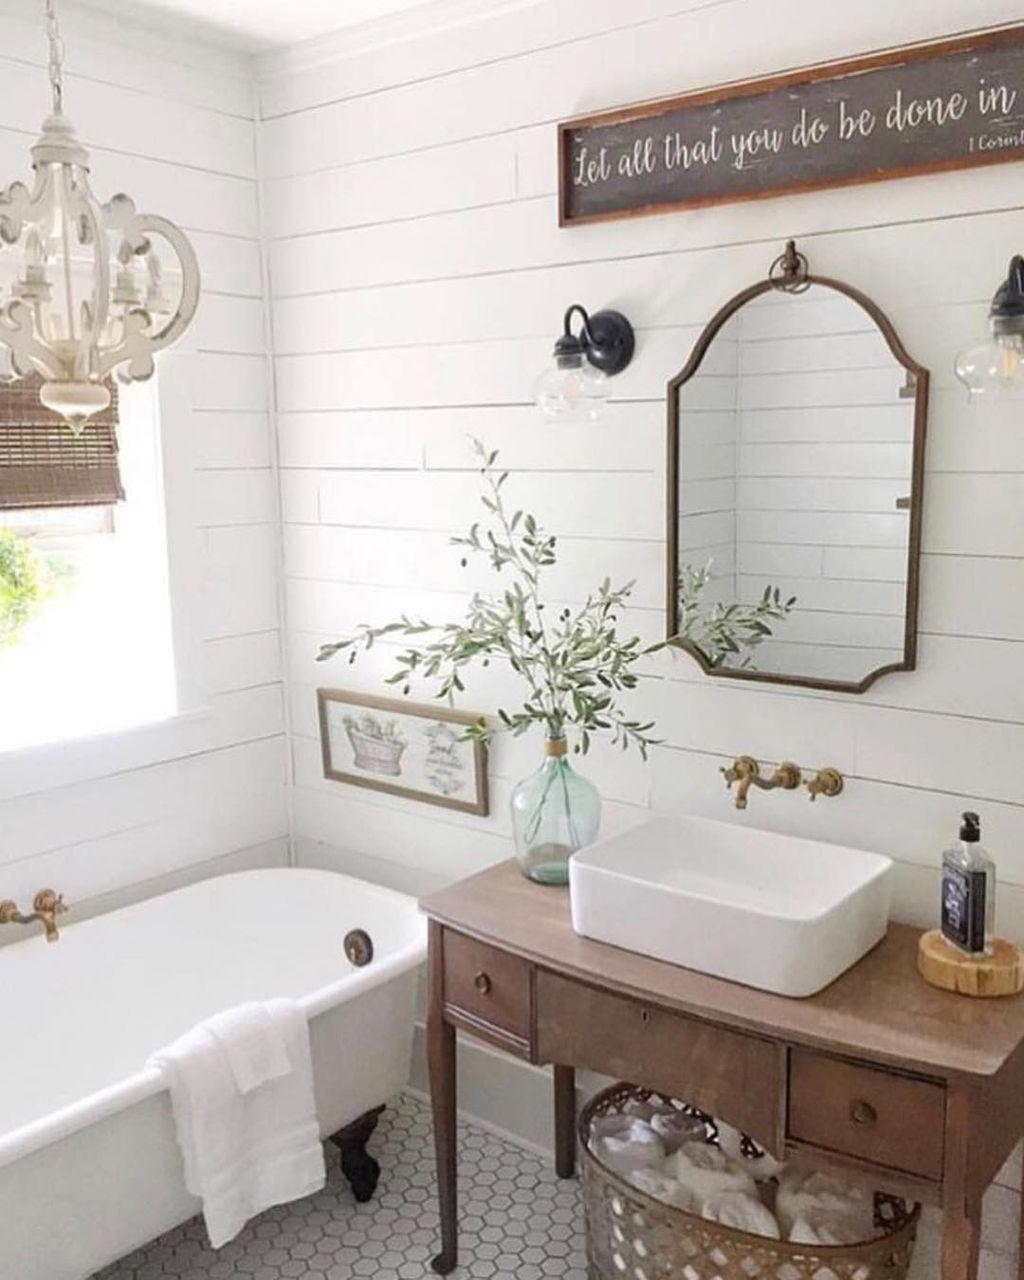 20 Shabby Chic Bathroom Magzhouse, Shabby Chic Bathroom Design